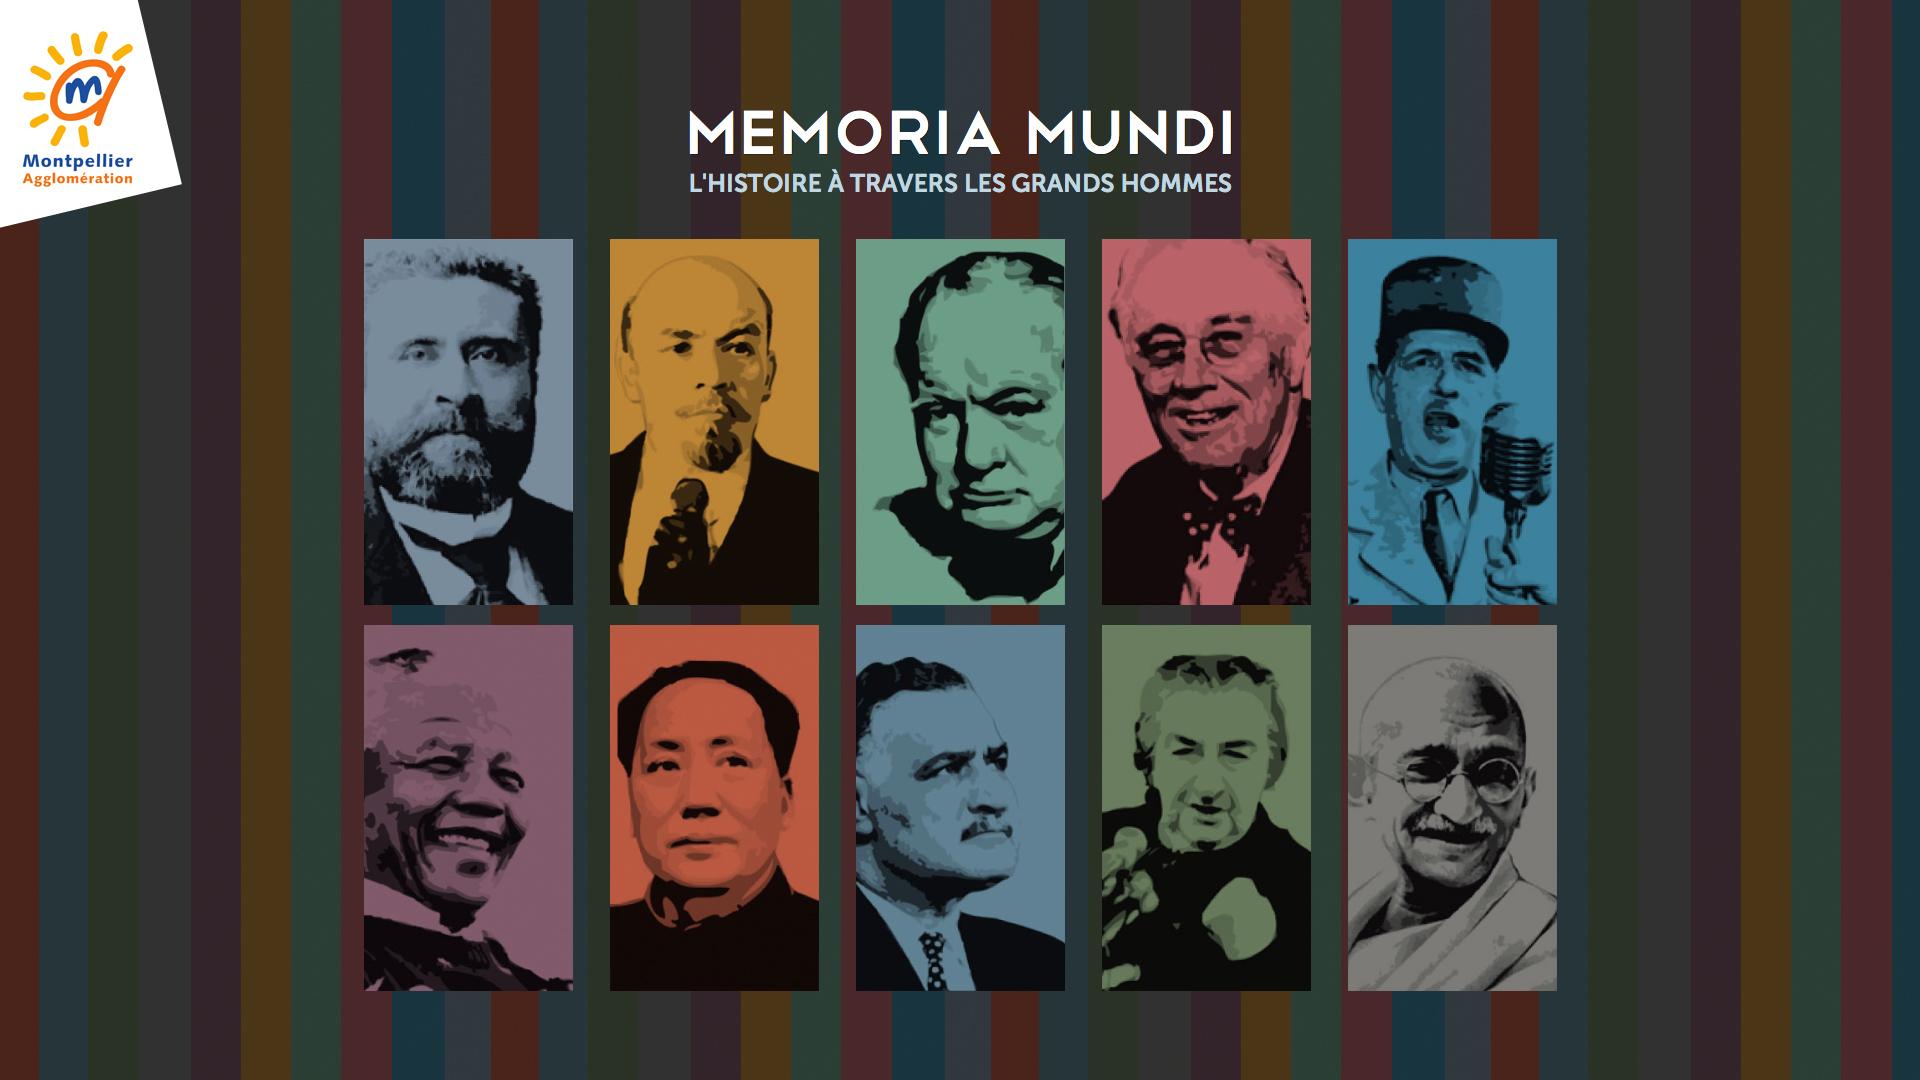 memoria-mundi-creation-site-internet-communication-caconcept-alexis-cretin-graphiste